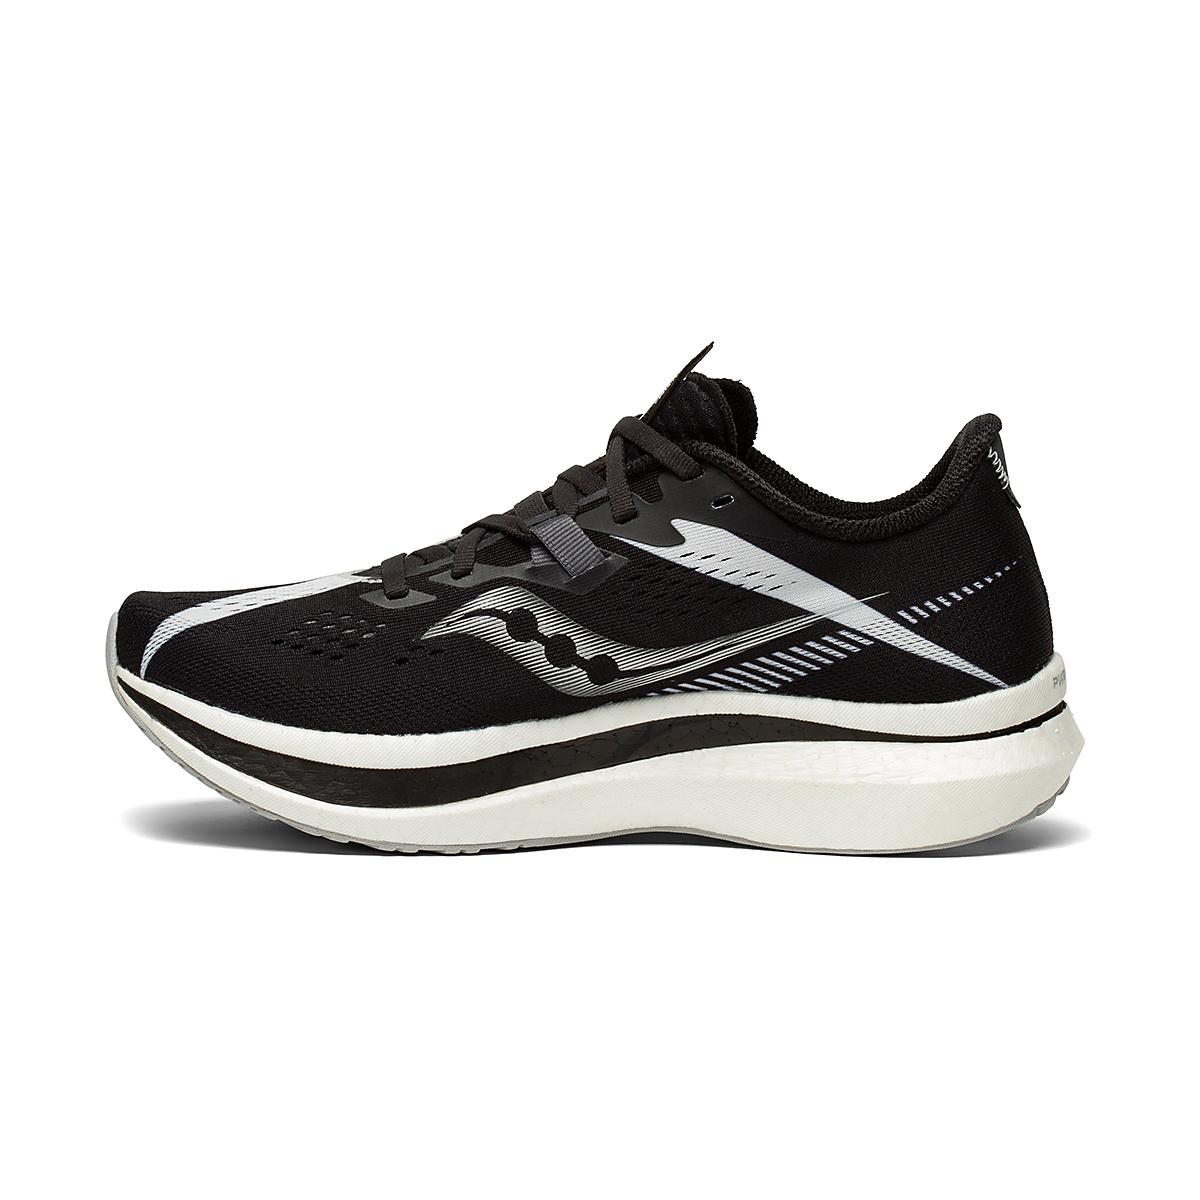 Women's Saucony Endorphin Pro 2 Running Shoe - Color: Black/White - Size: 5 - Width: Regular, Black/White, large, image 2